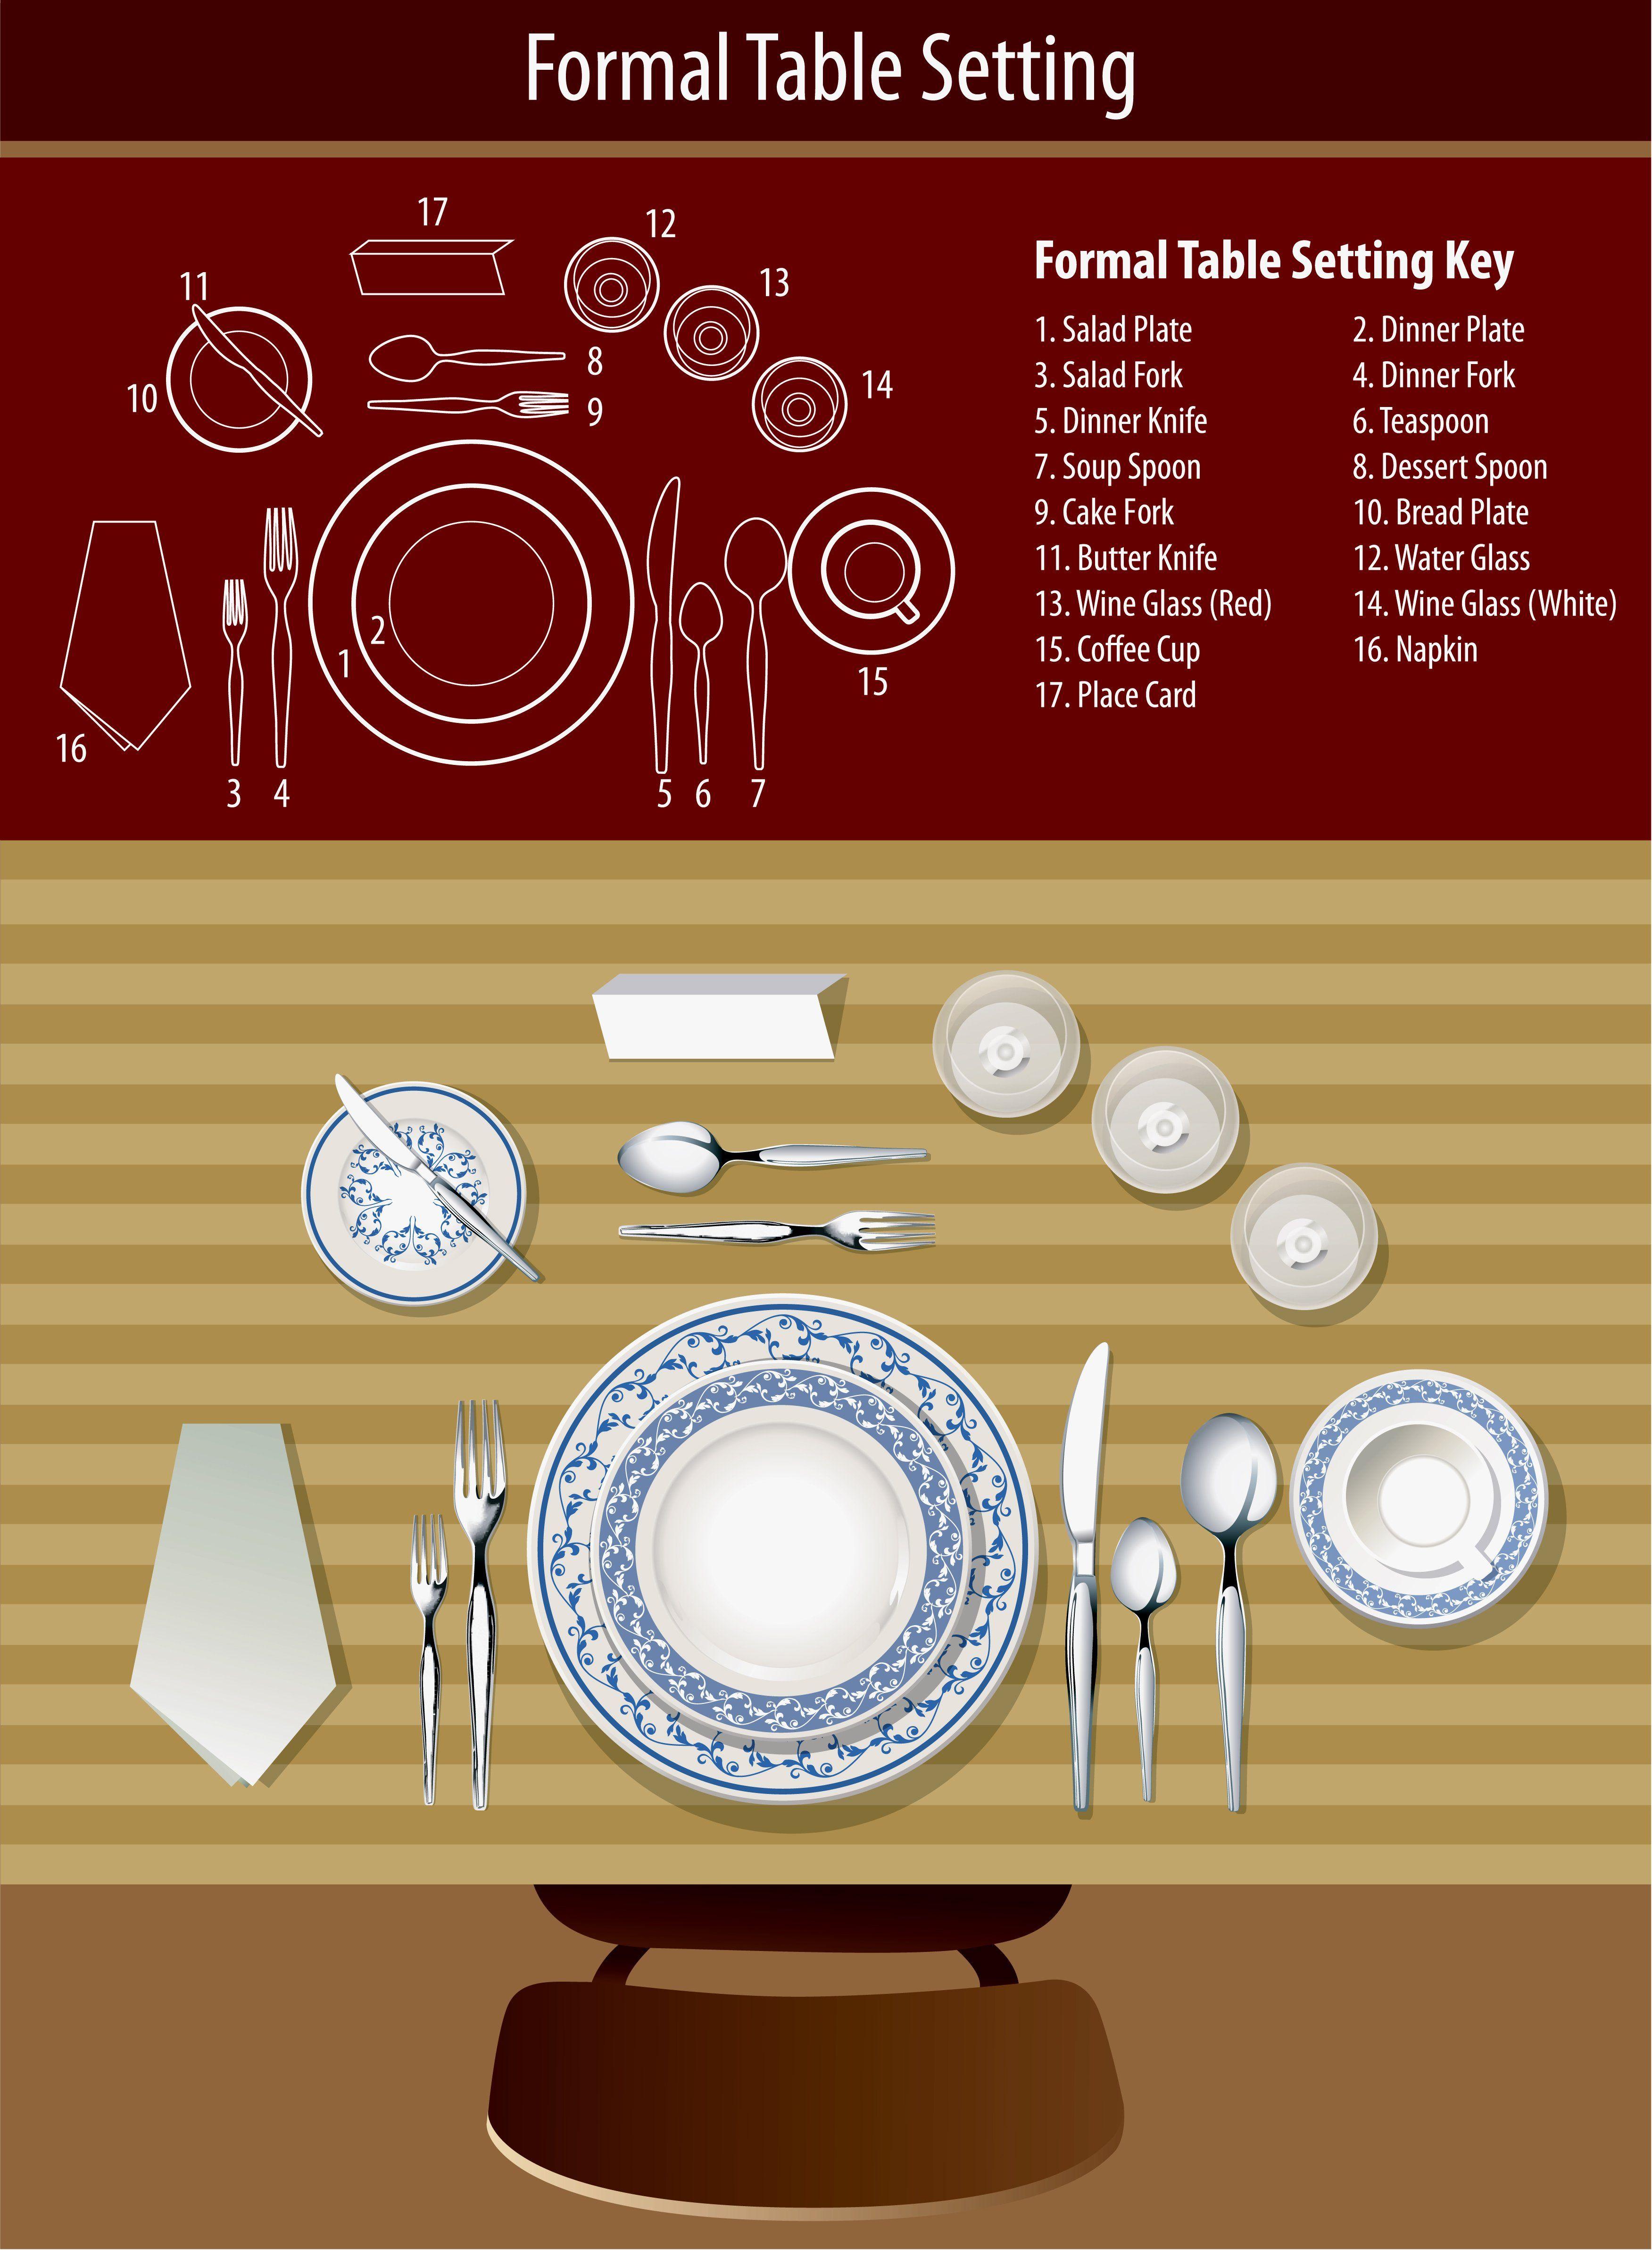 Fine Dining Etiquette For Servers In 2020 Fine Dining Table Setting Dining Etiquette Restaurant Table Setting